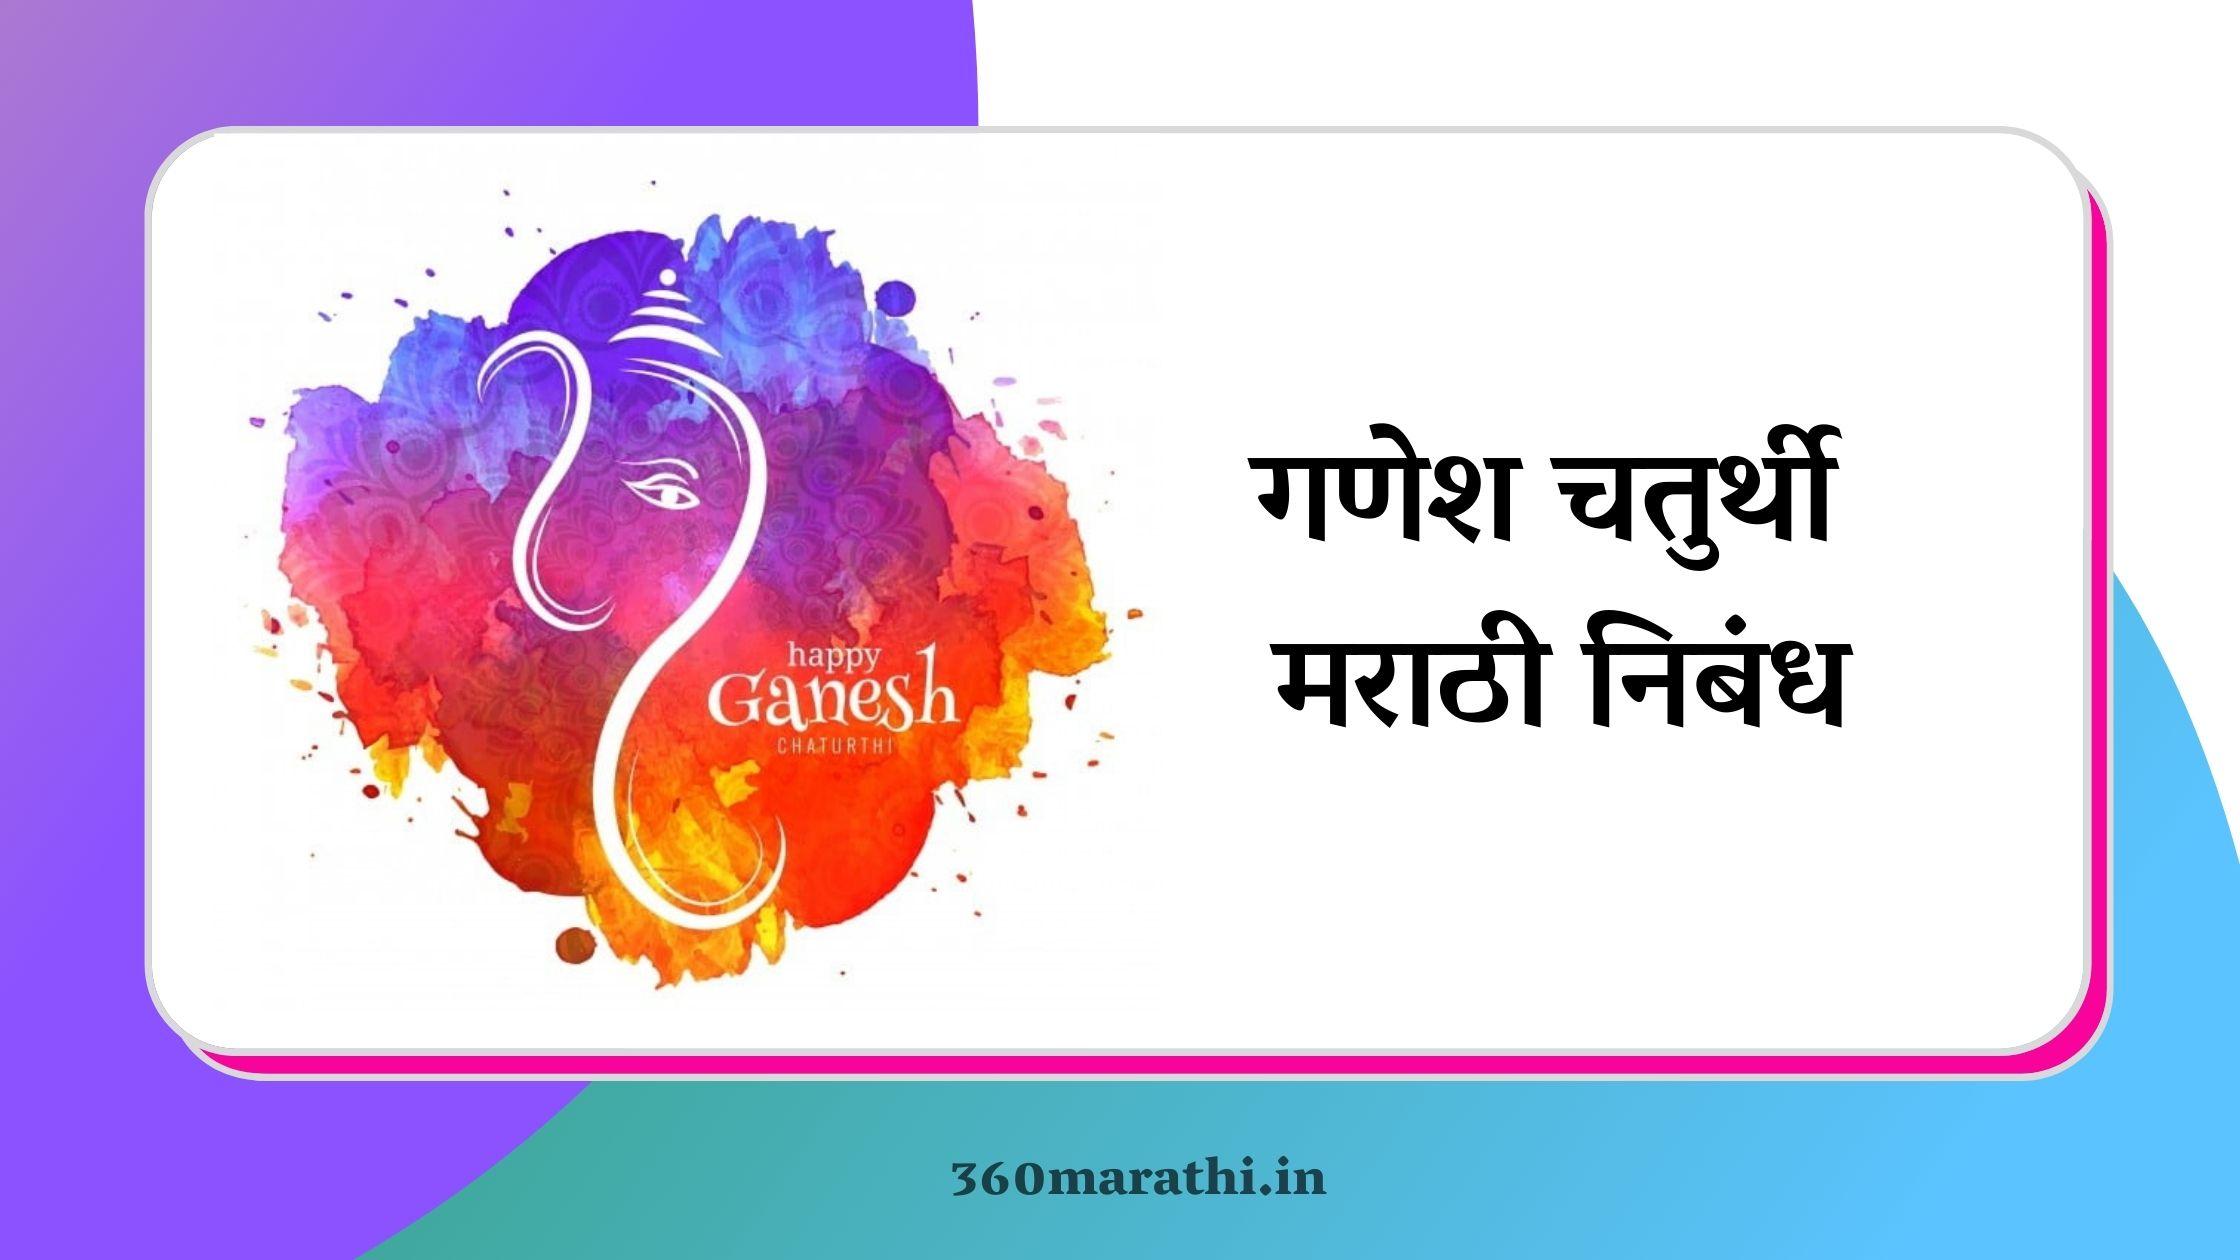 गणेश चतुर्थी मराठी निबंध   Ganesh Chaturthi Essay in Marathi